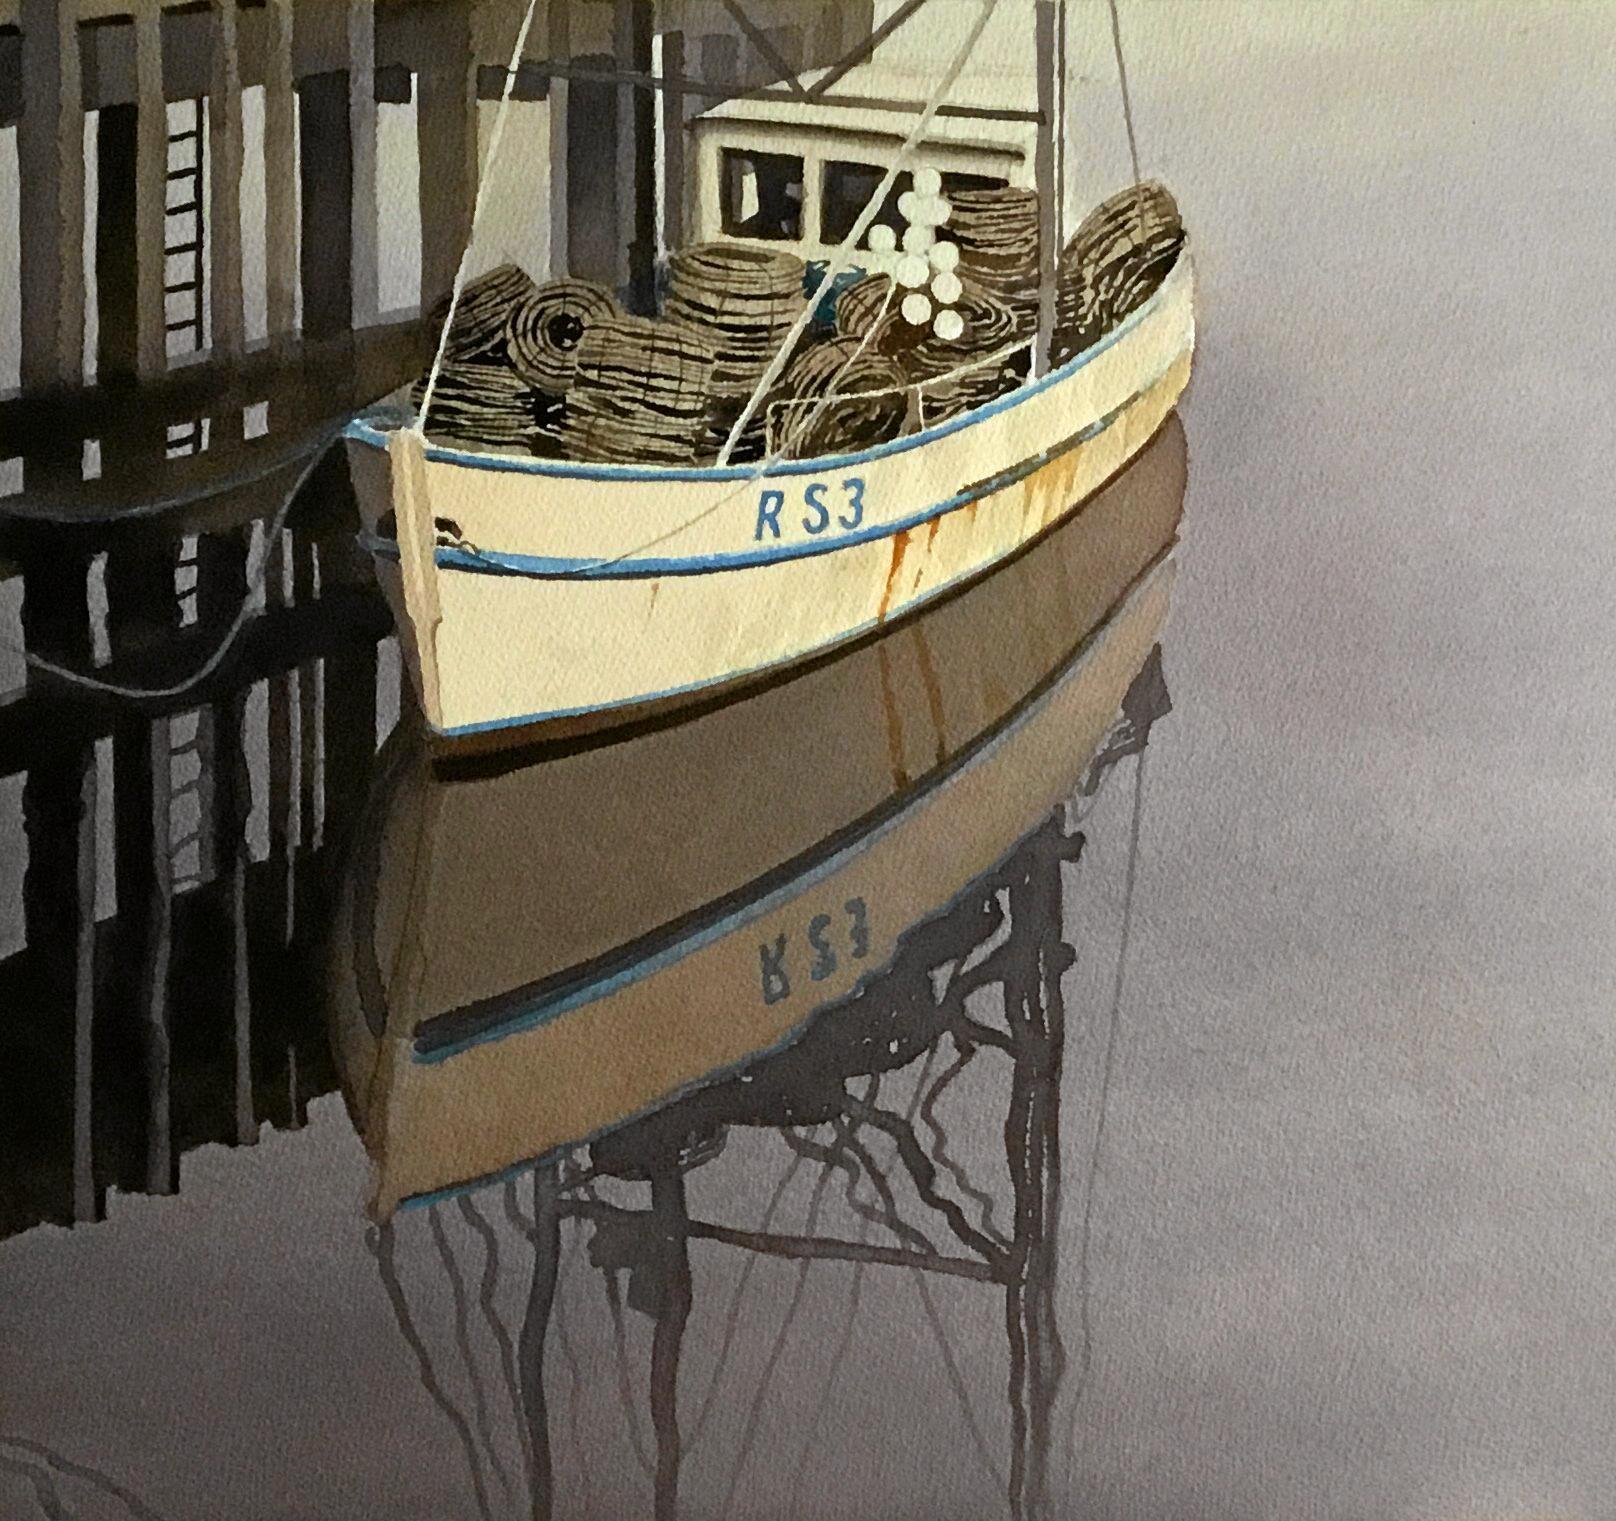 Montville Art Gallery has the watercolour Reflections by Bruce Buchanan.